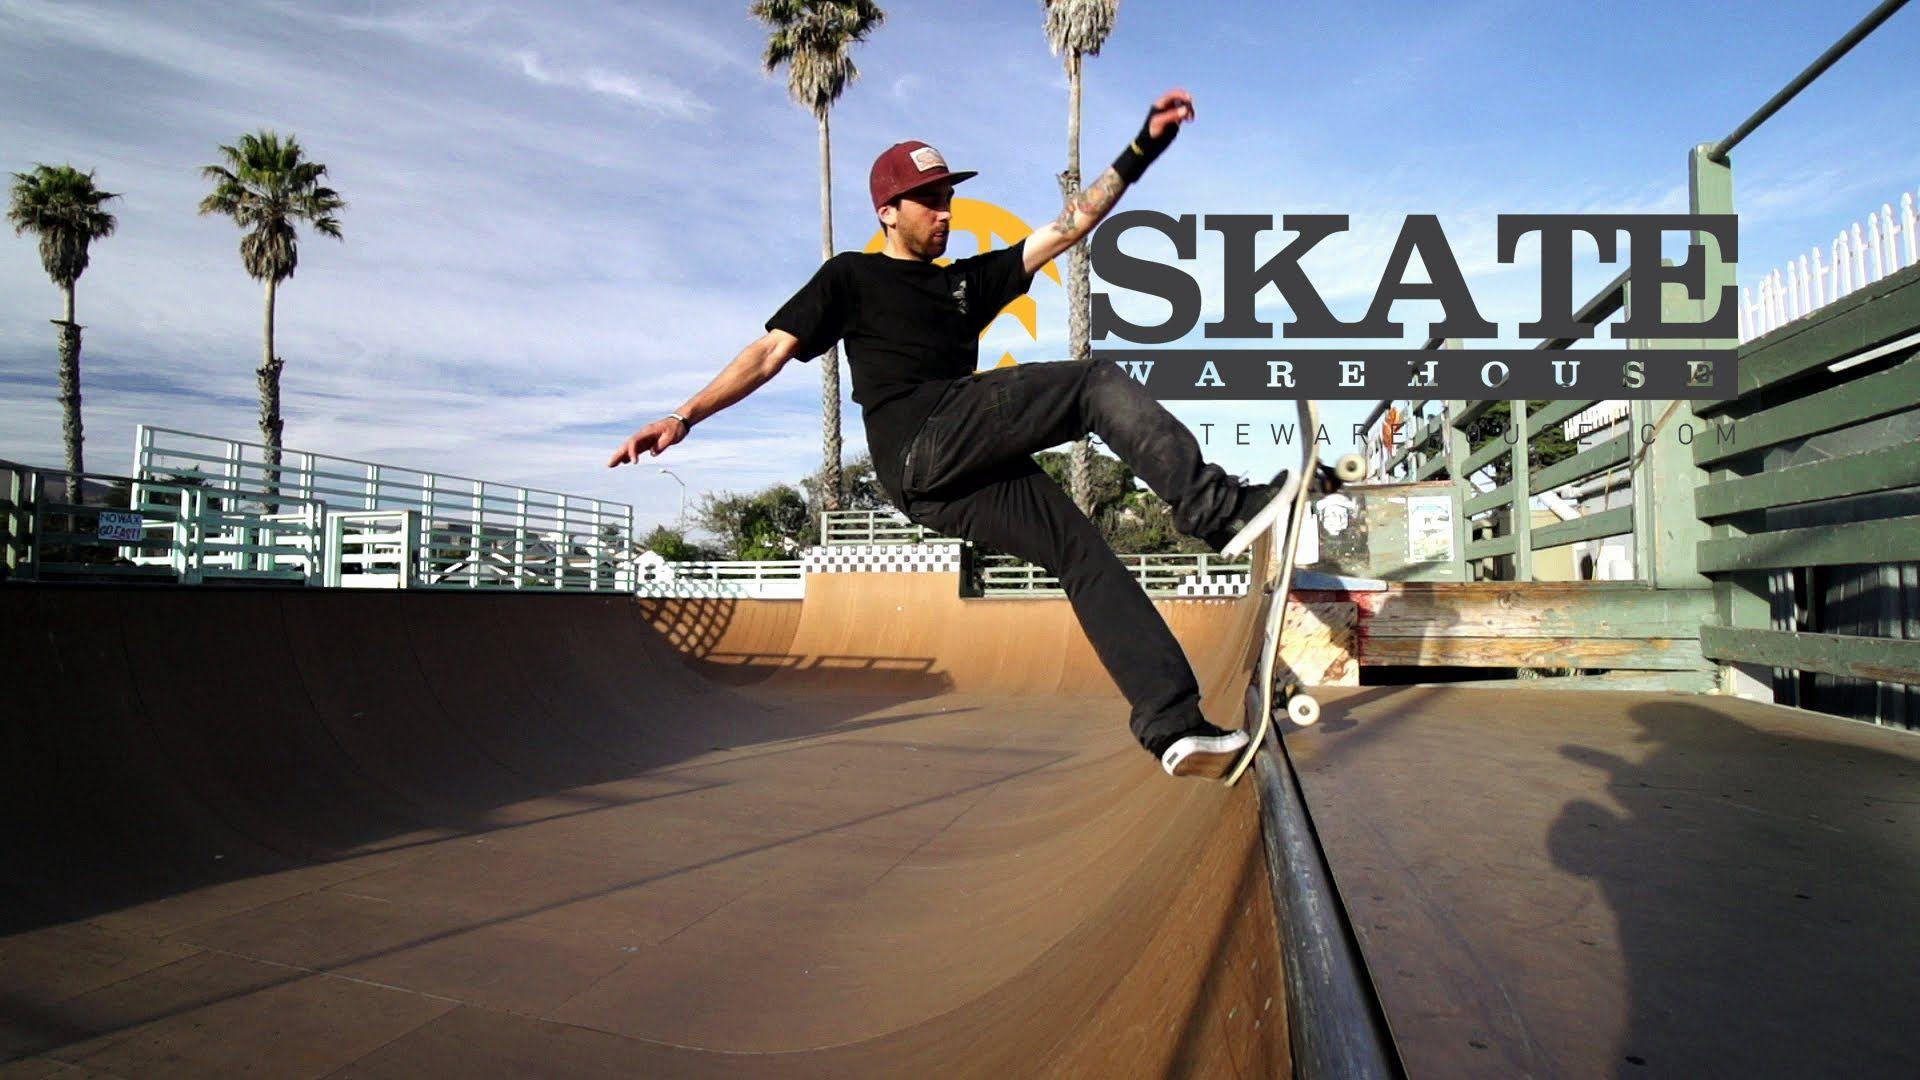 Skateboard Tricks Wallpapers Widescreen For Desktop Wallpaper( )